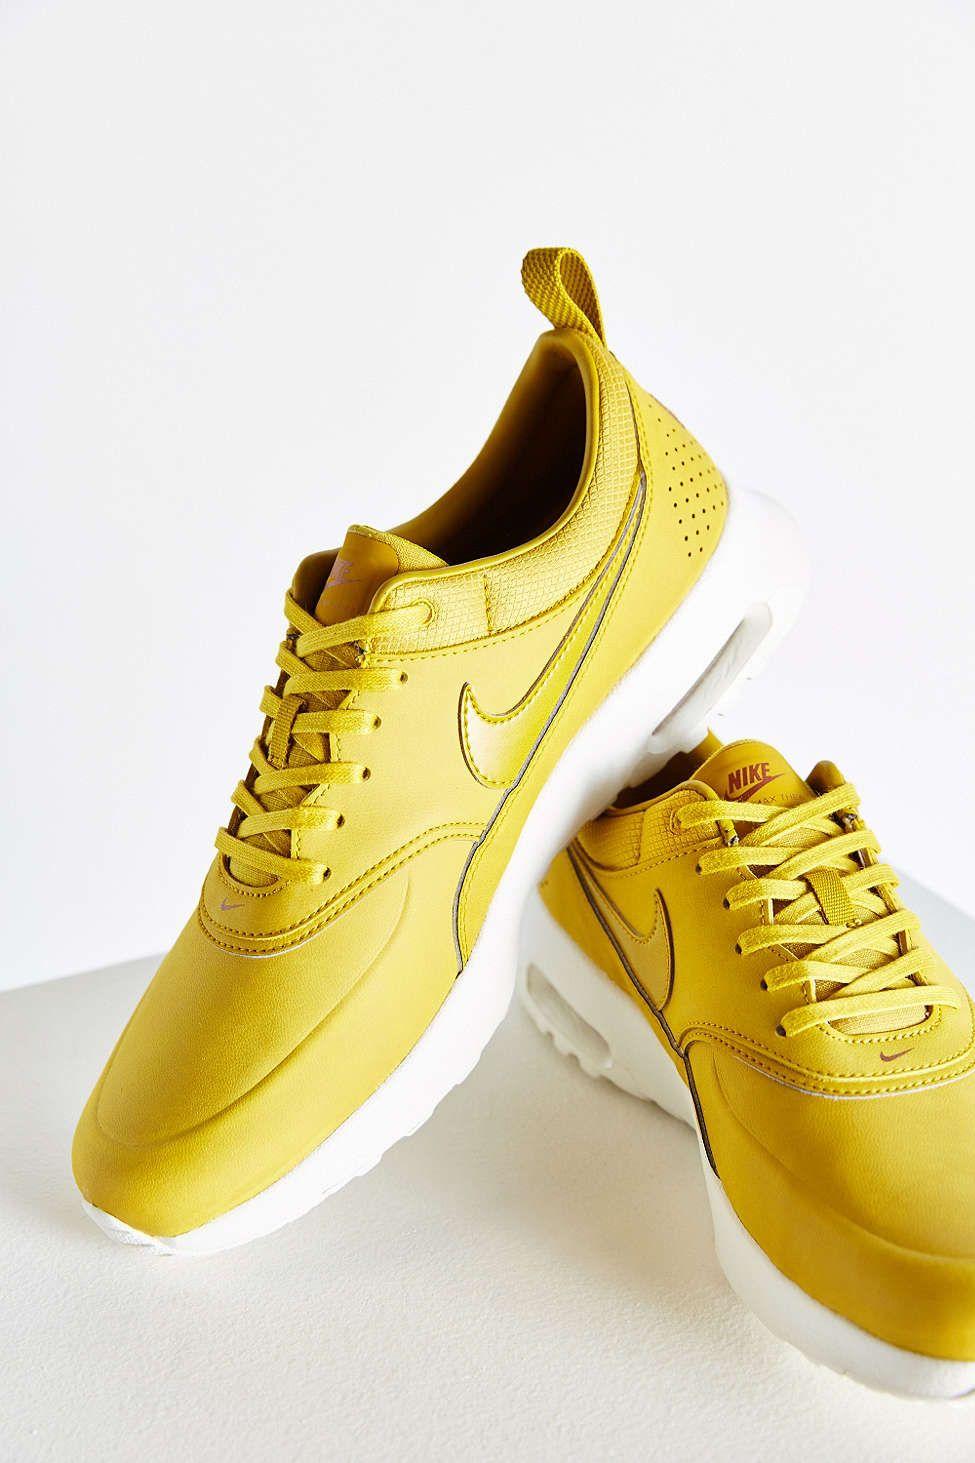 Nike Air Max Thea Premium Sneaker - Urban Outfitters   Outfit Urban ... ef4e6754fe81